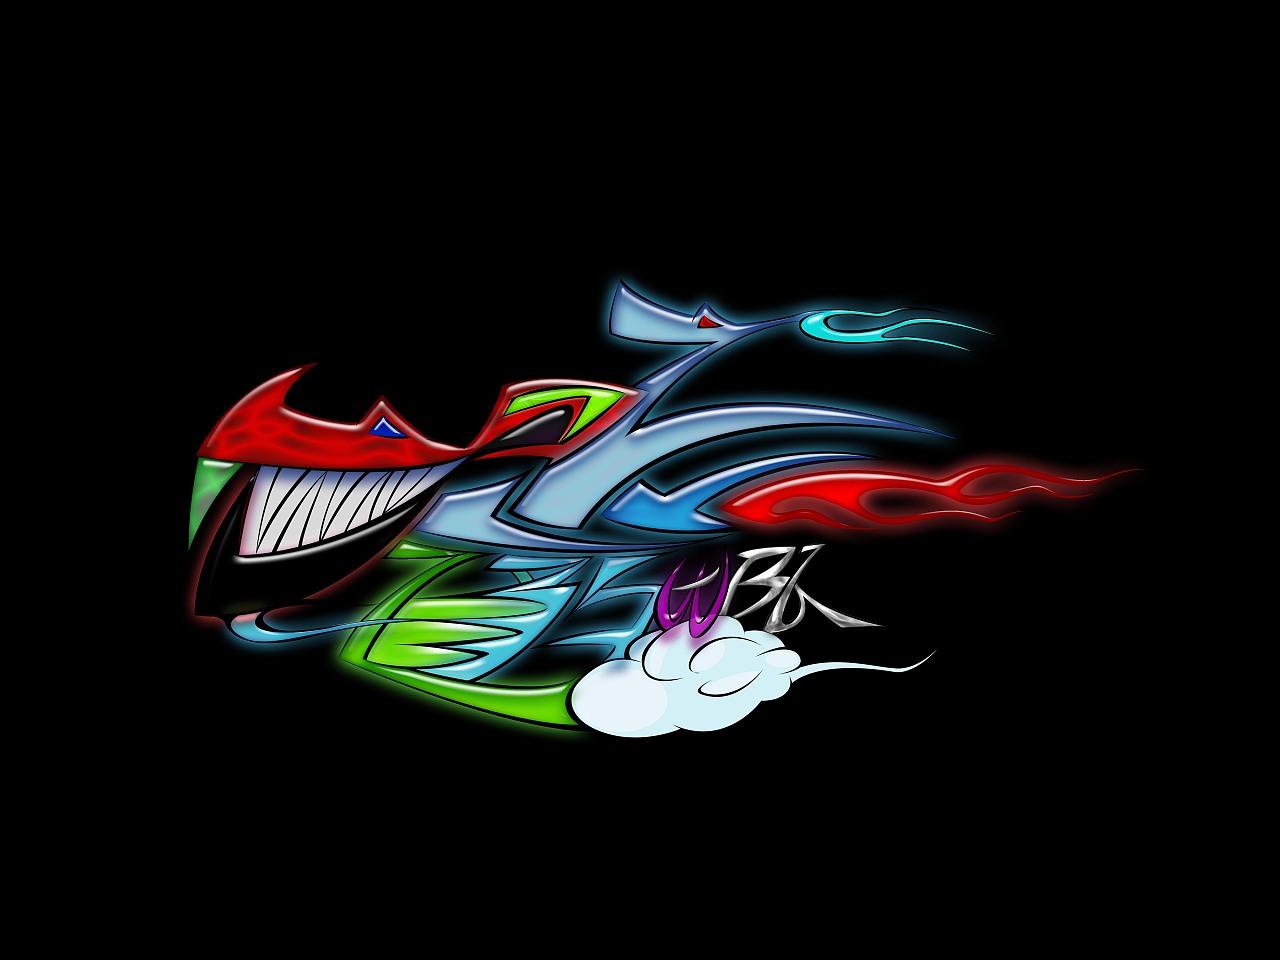 http://www.sdywj.com/pics/bd18541935.jpg_飞豹团队logo|平面|标志|wzhywjg1 - 原创作品 - 站酷